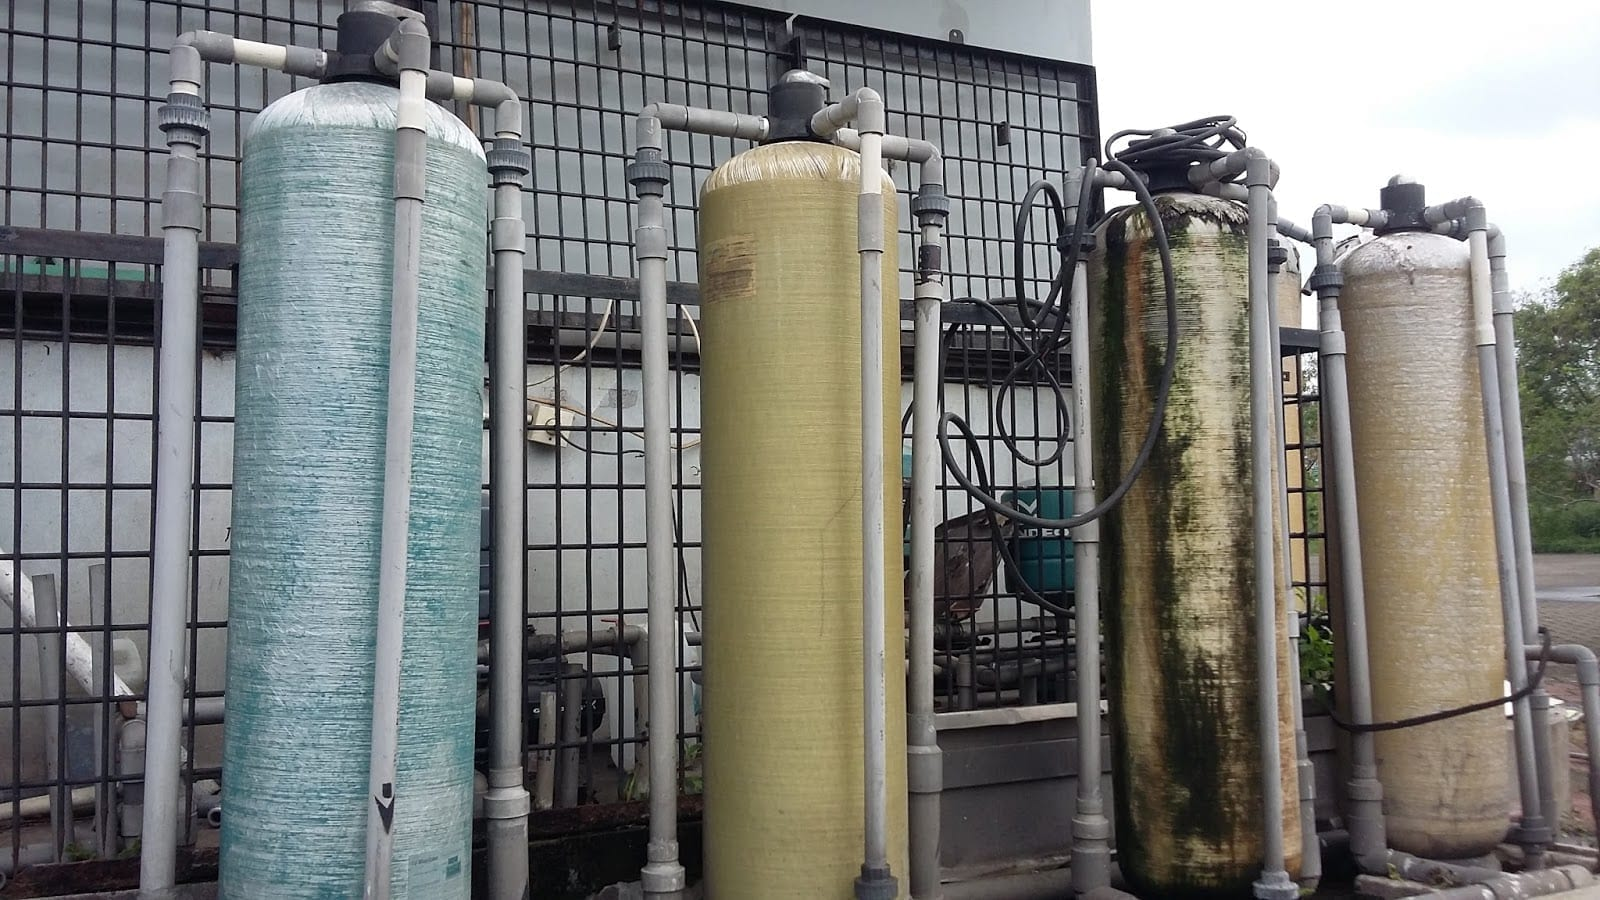 Cara Menyuling Air Kotor Menjadi Air Bersih